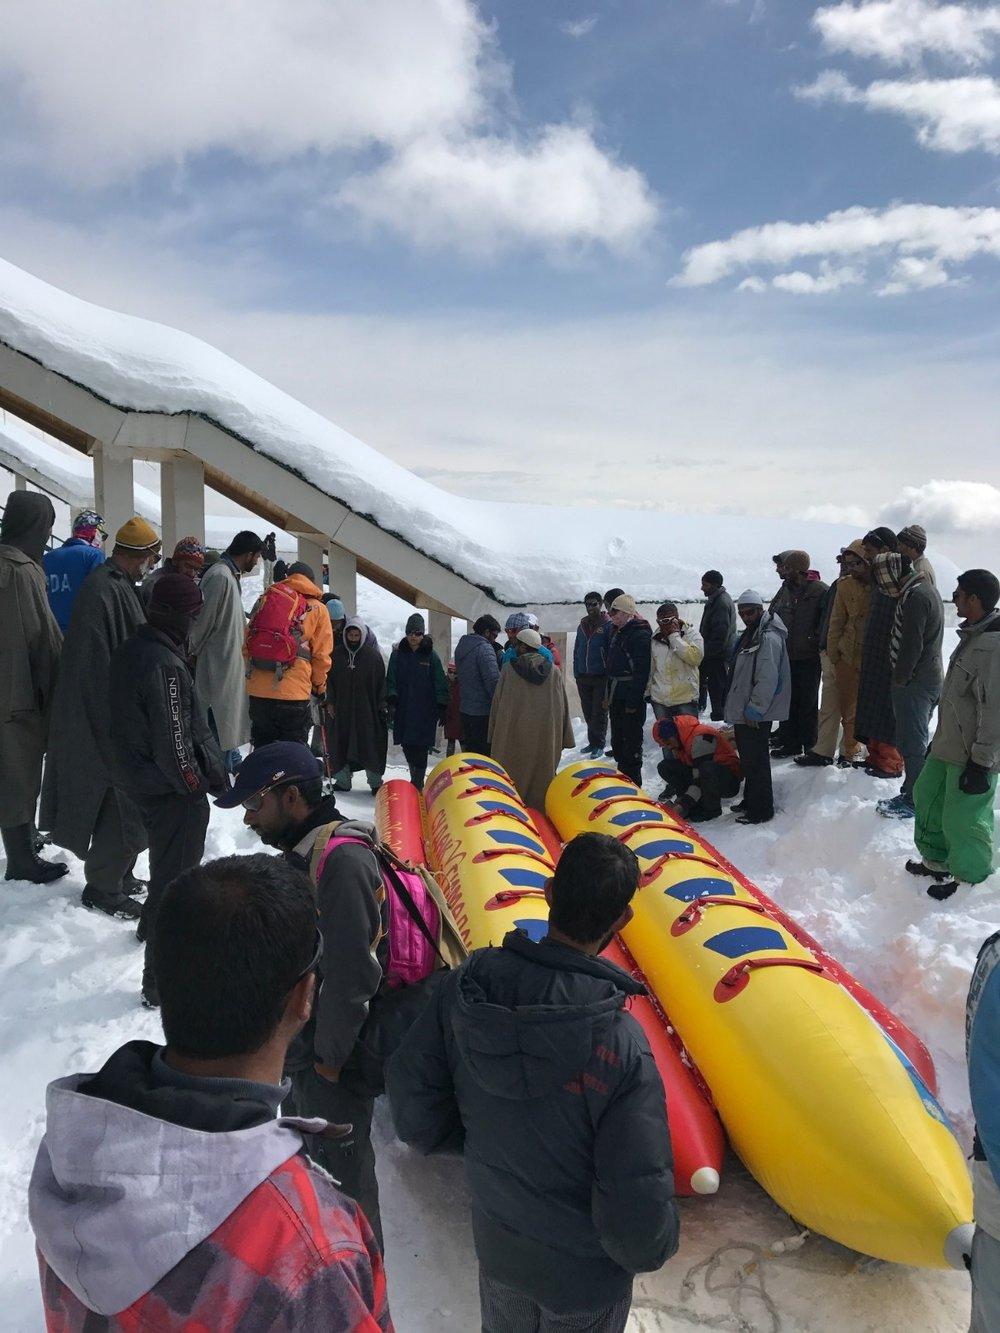 Banana Raft Rides Behind a Snowmobile